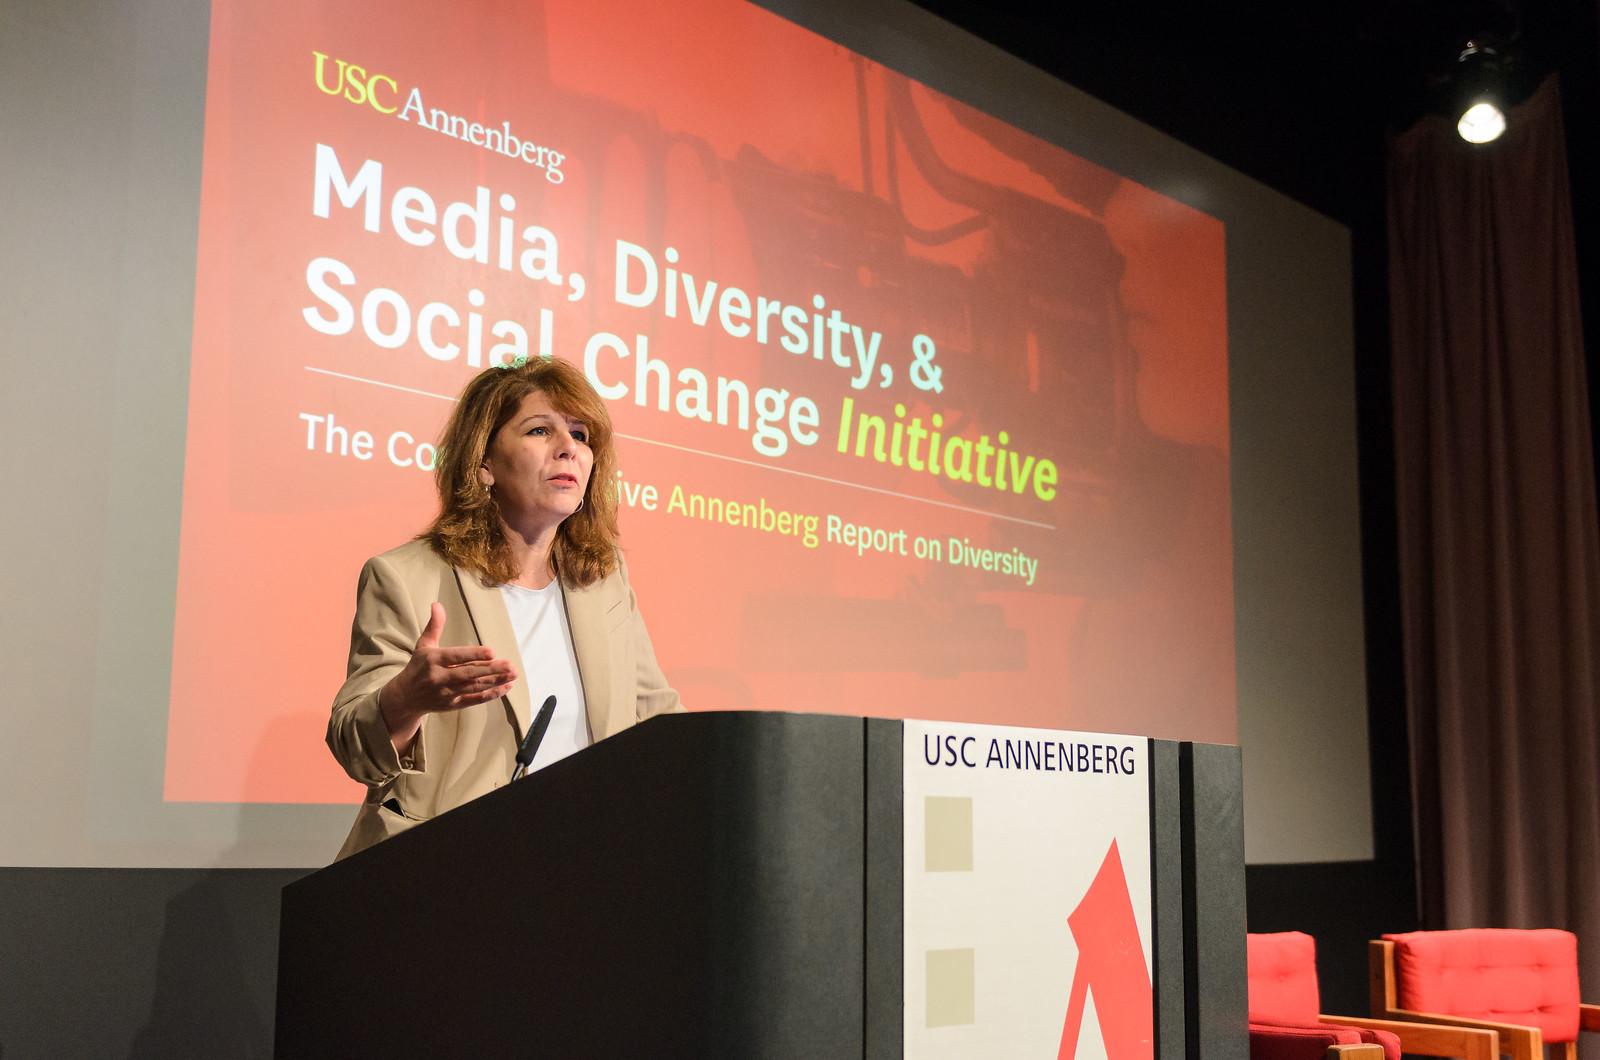 Transforming Hollywood 7: Diversifying Entertainment